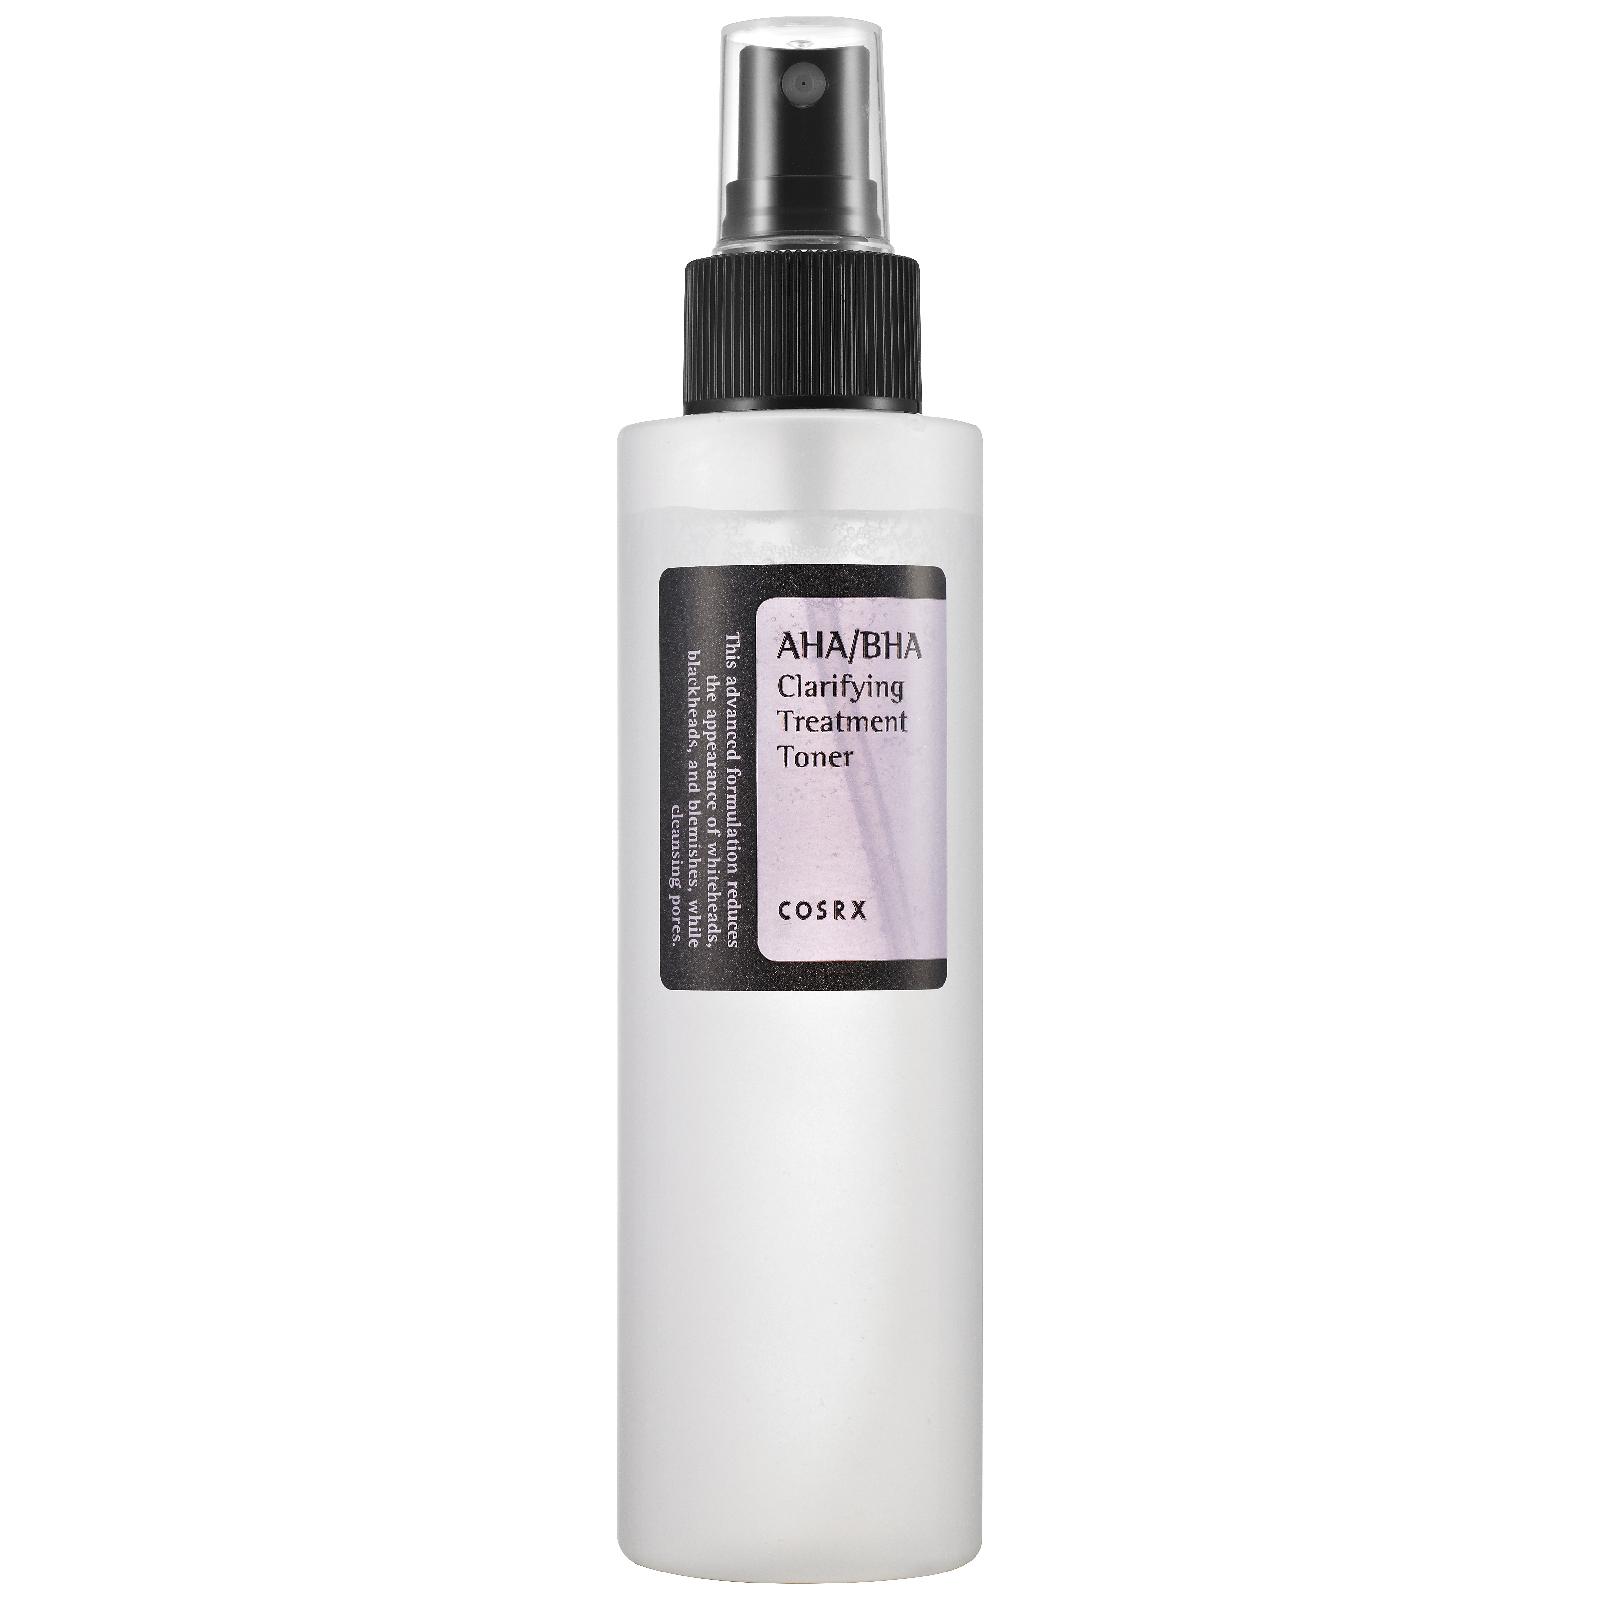 Cosrx Aha Bha Clarifying Treatment Toner 150ml Free Us Shipping Honey Ceramide Eye Cream 30ml Description